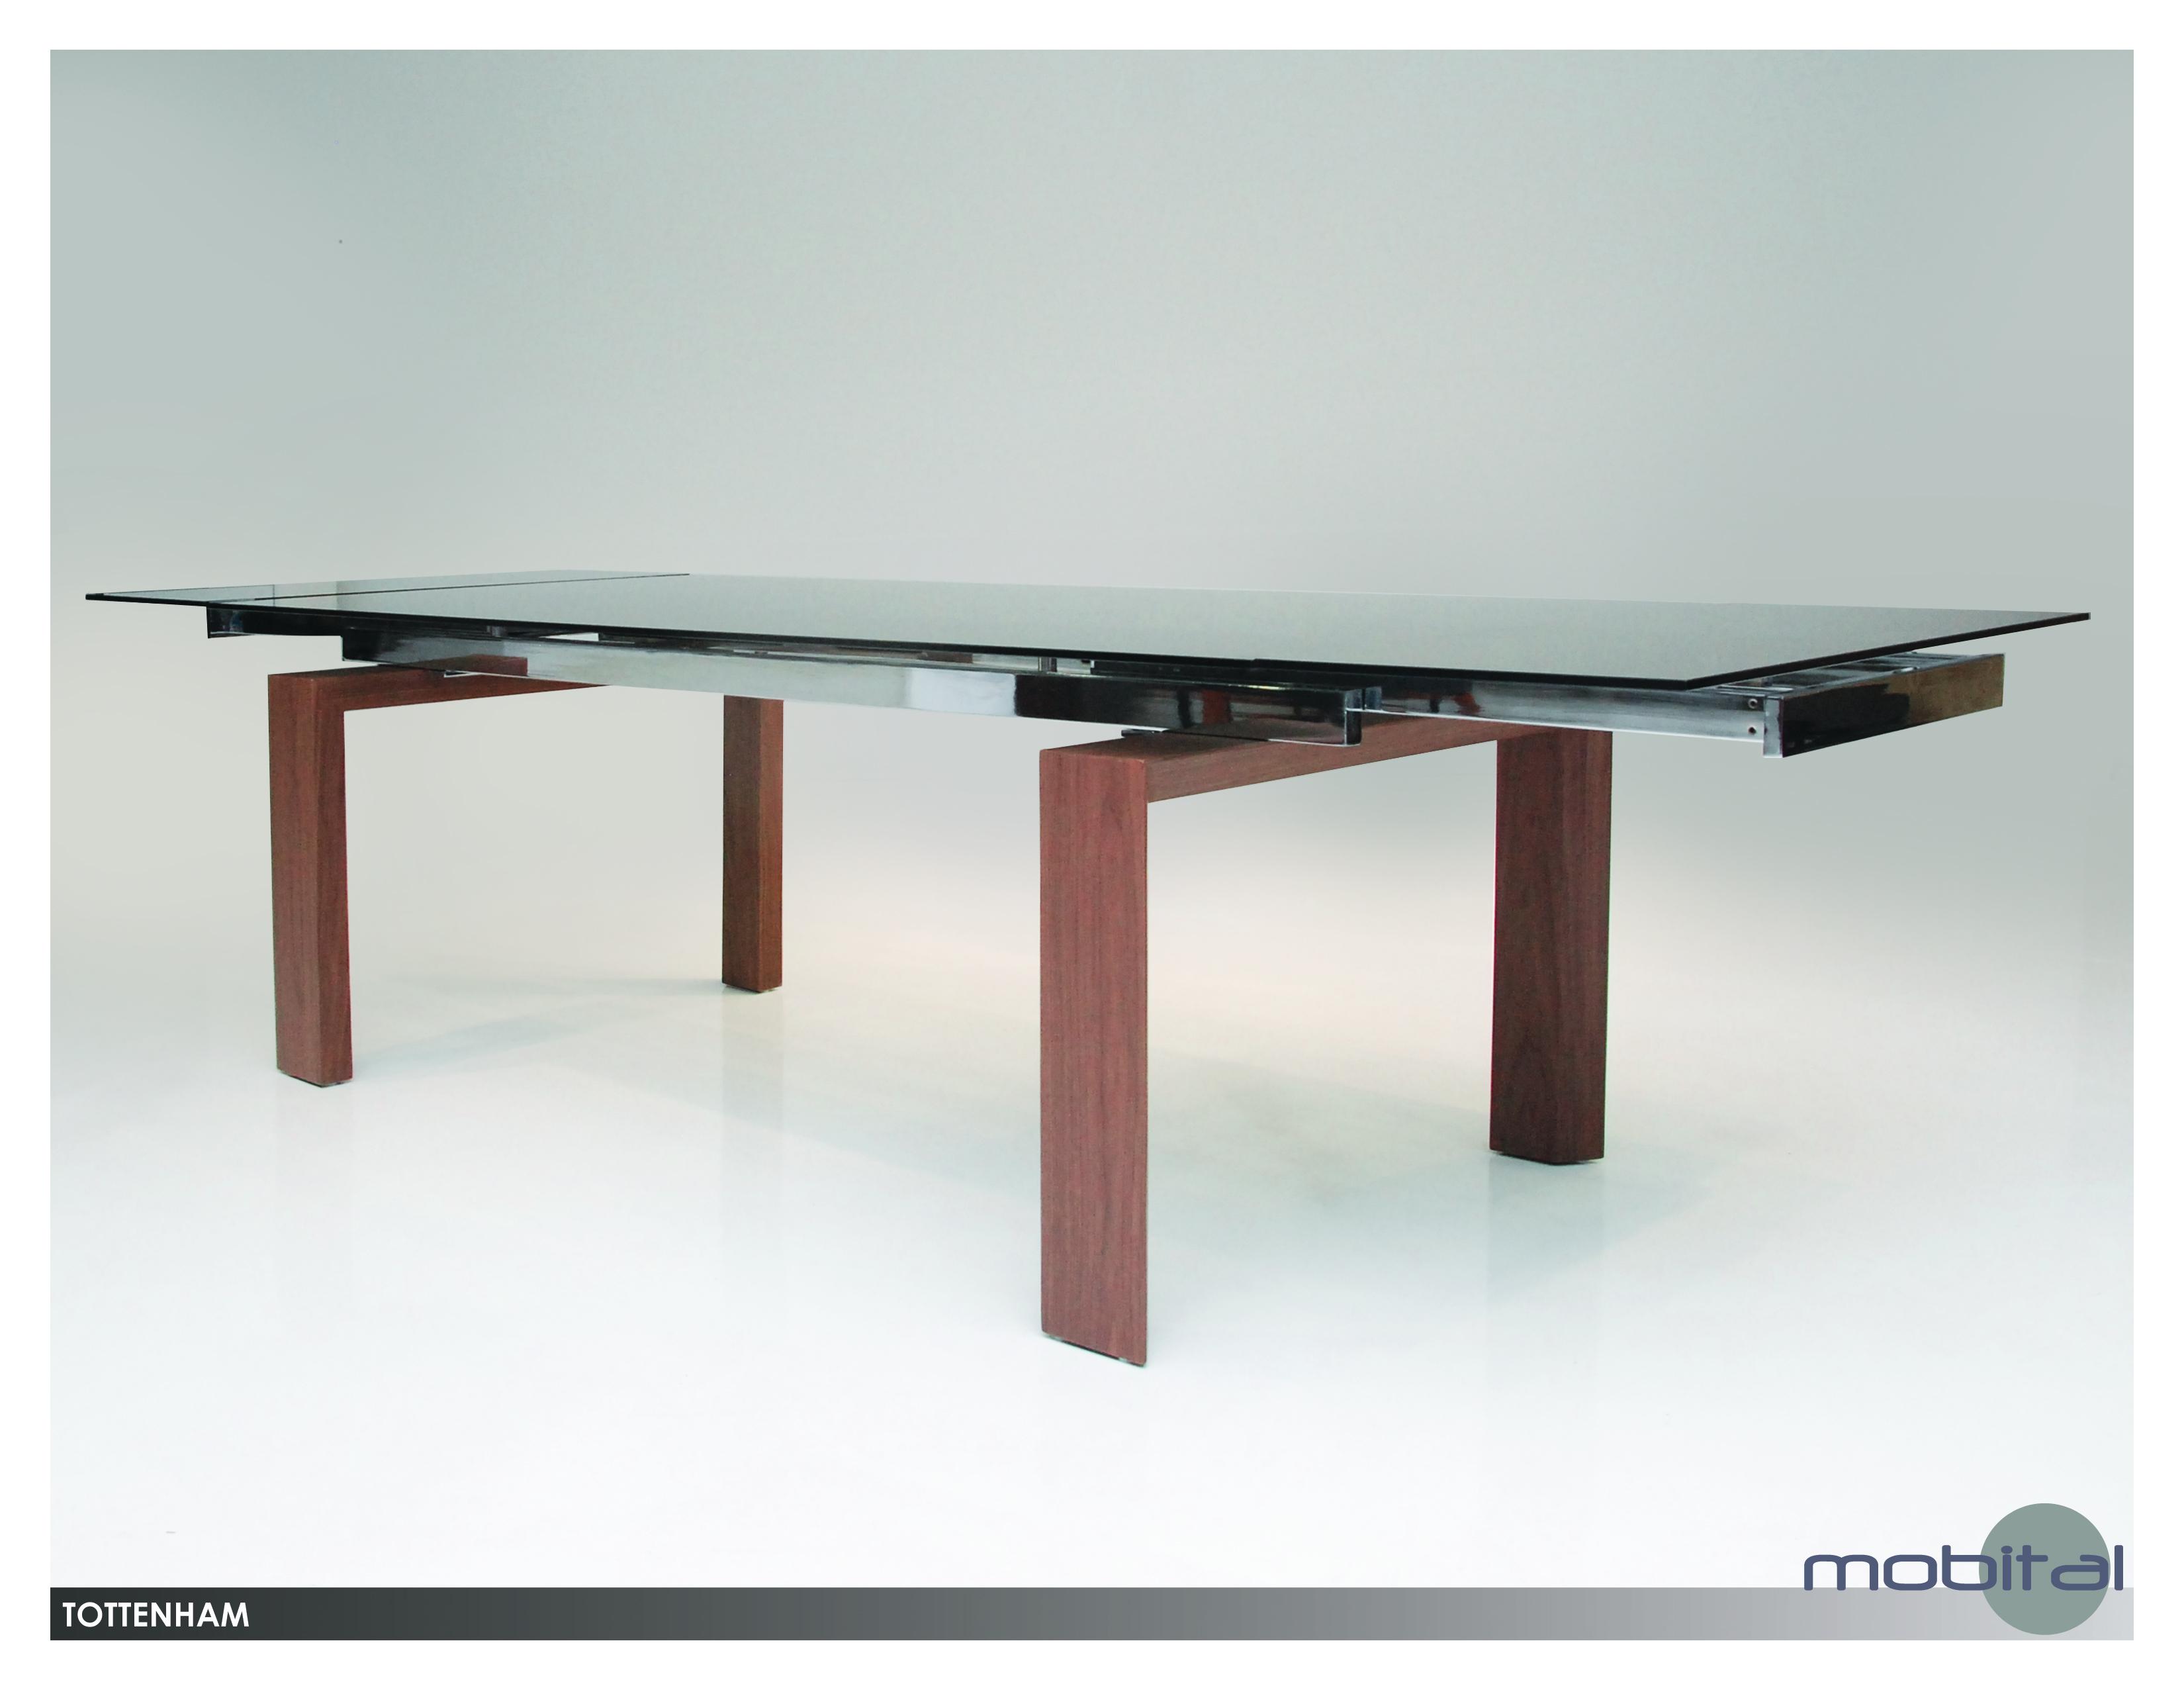 Tottenham Extending Dining Table Smoke Glass With Walnut Veneer Legs Metro Element